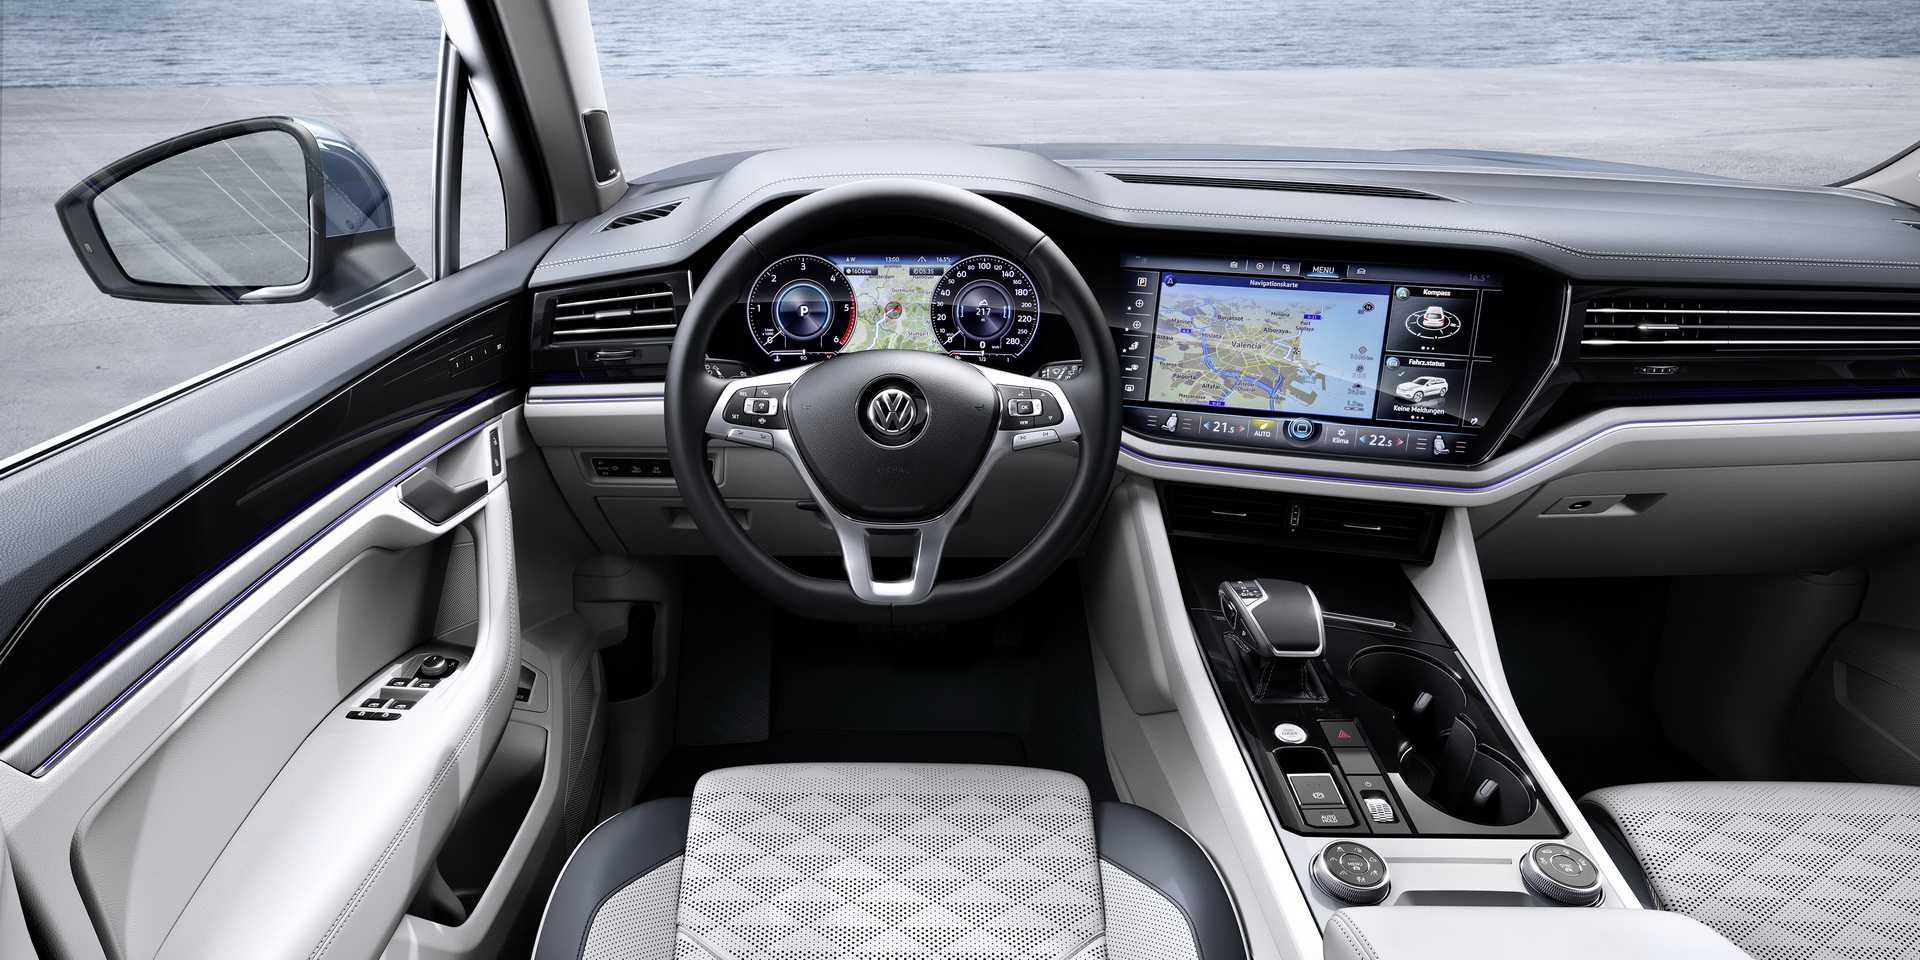 2019-VW-Touareg-20-1 - Rutamotor